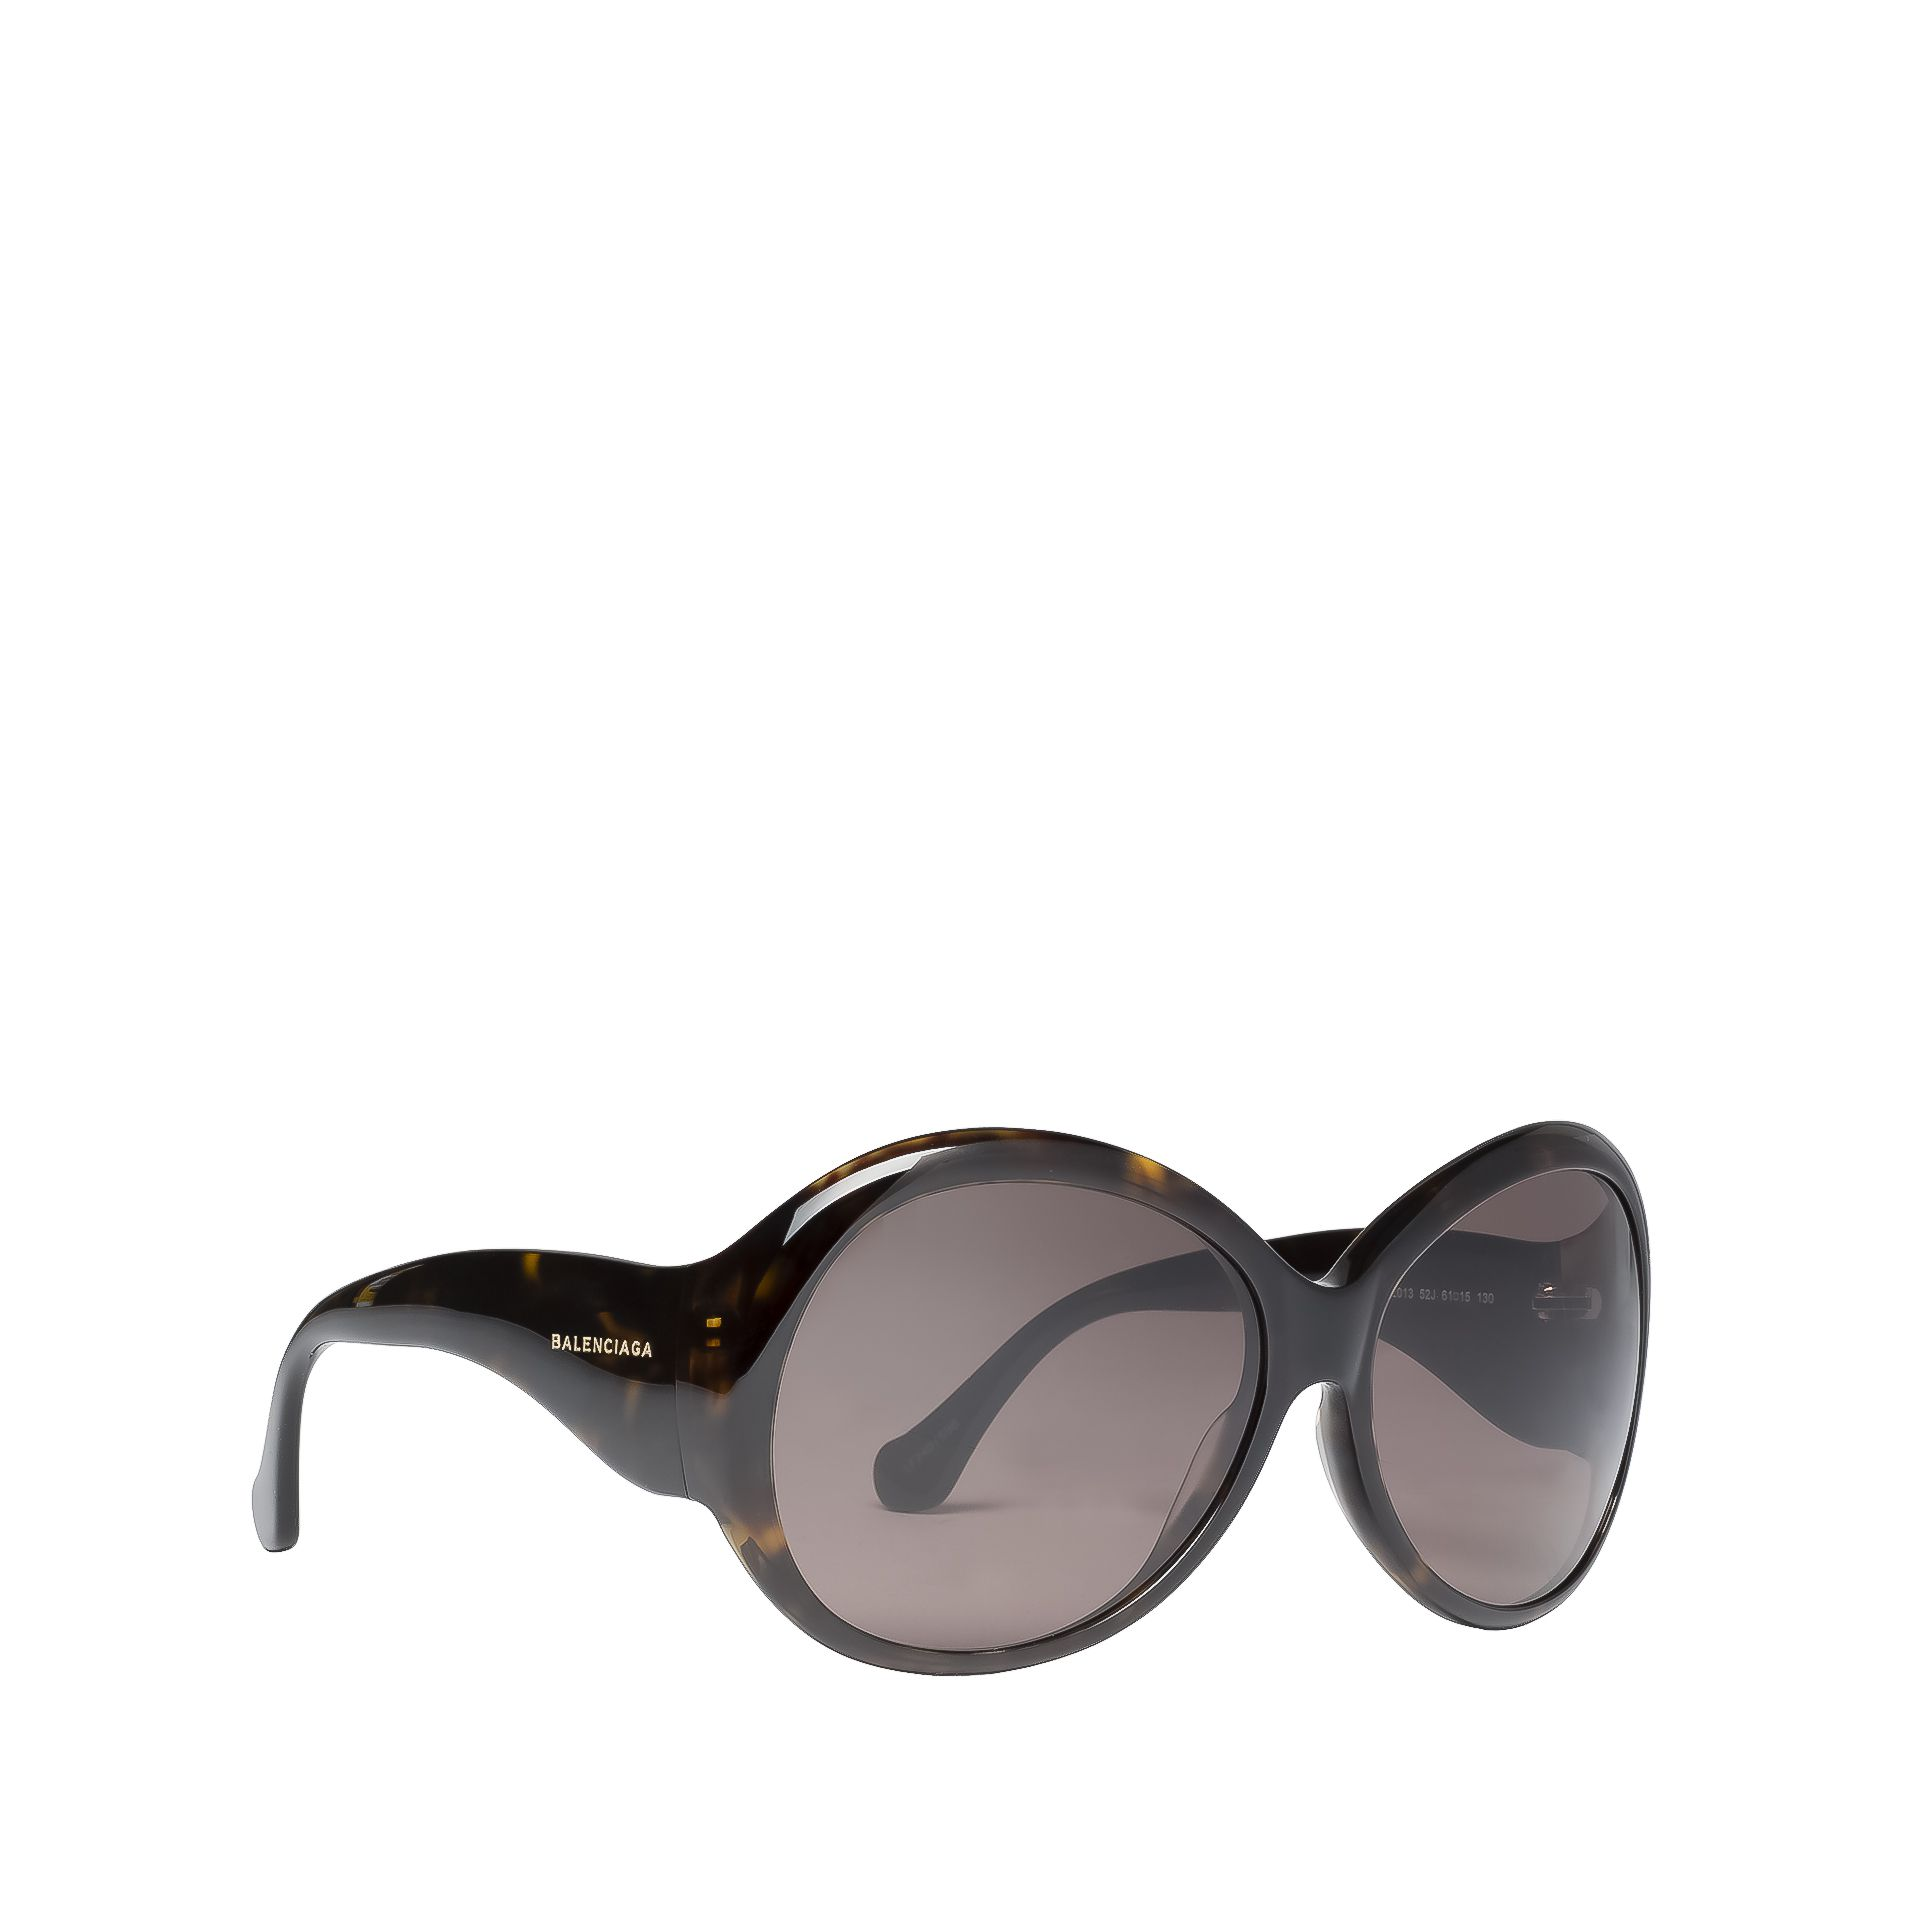 BALENCIAGA Edition Sonnenbrille Sonnenbrillen D f